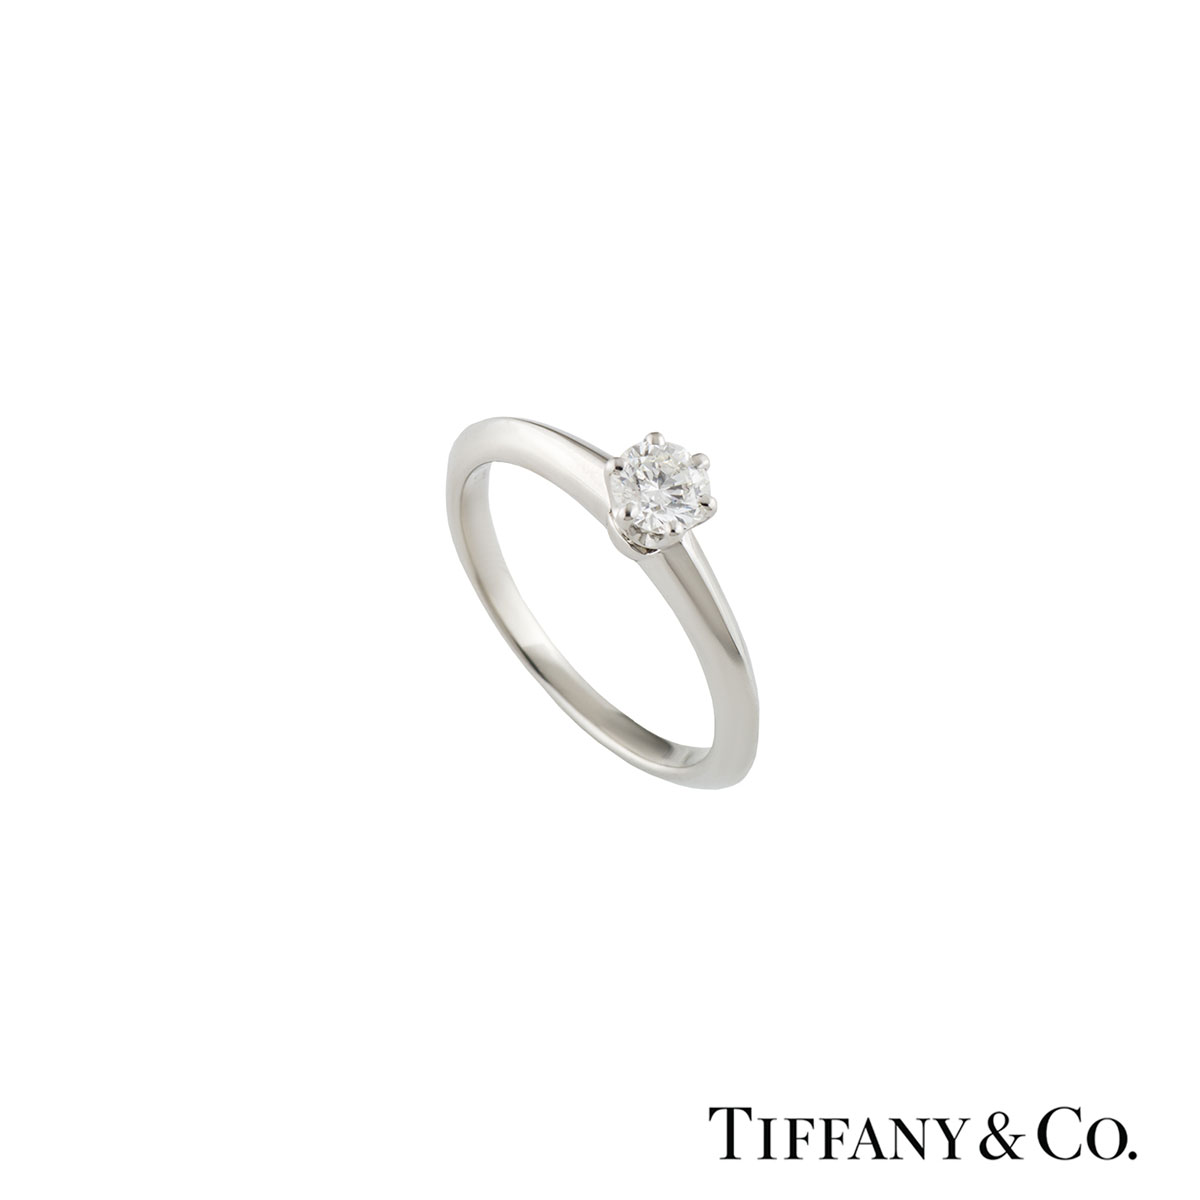 Tiffany & Co. Platinum Diamond Setting Band Ring 0.22ct E/VS1